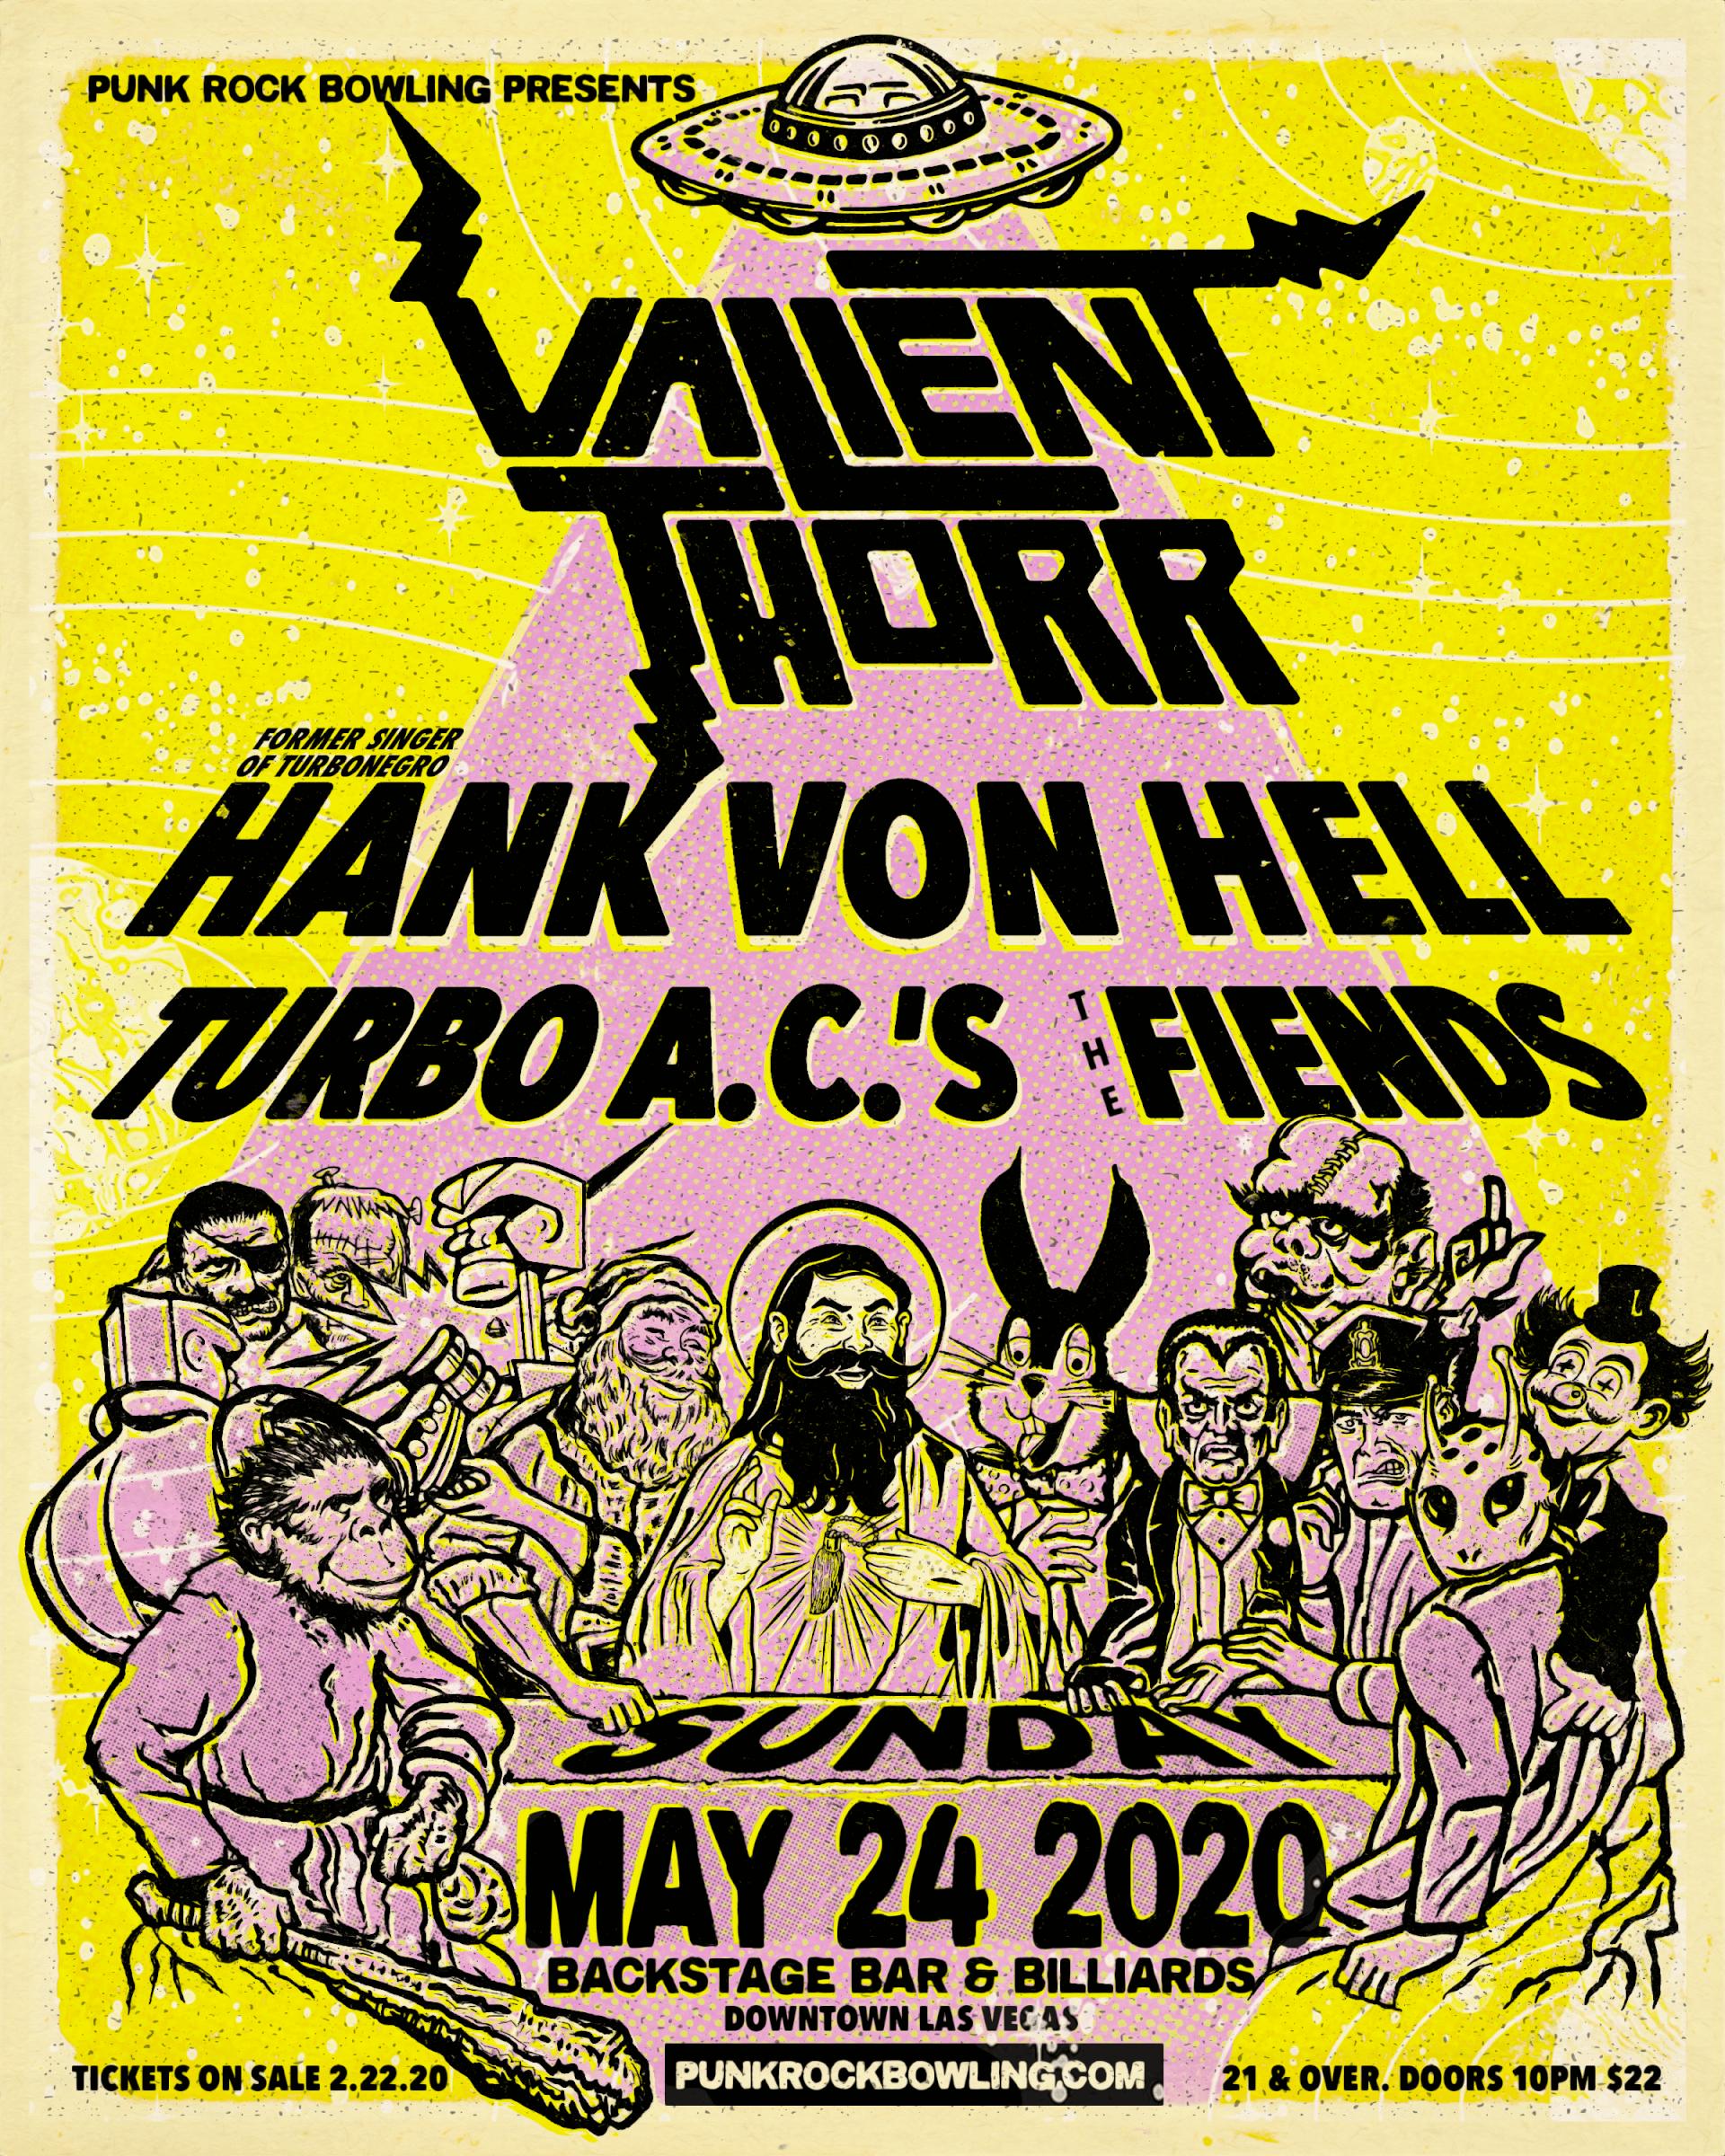 Valient Thorr Punk Rock Bowling 2020